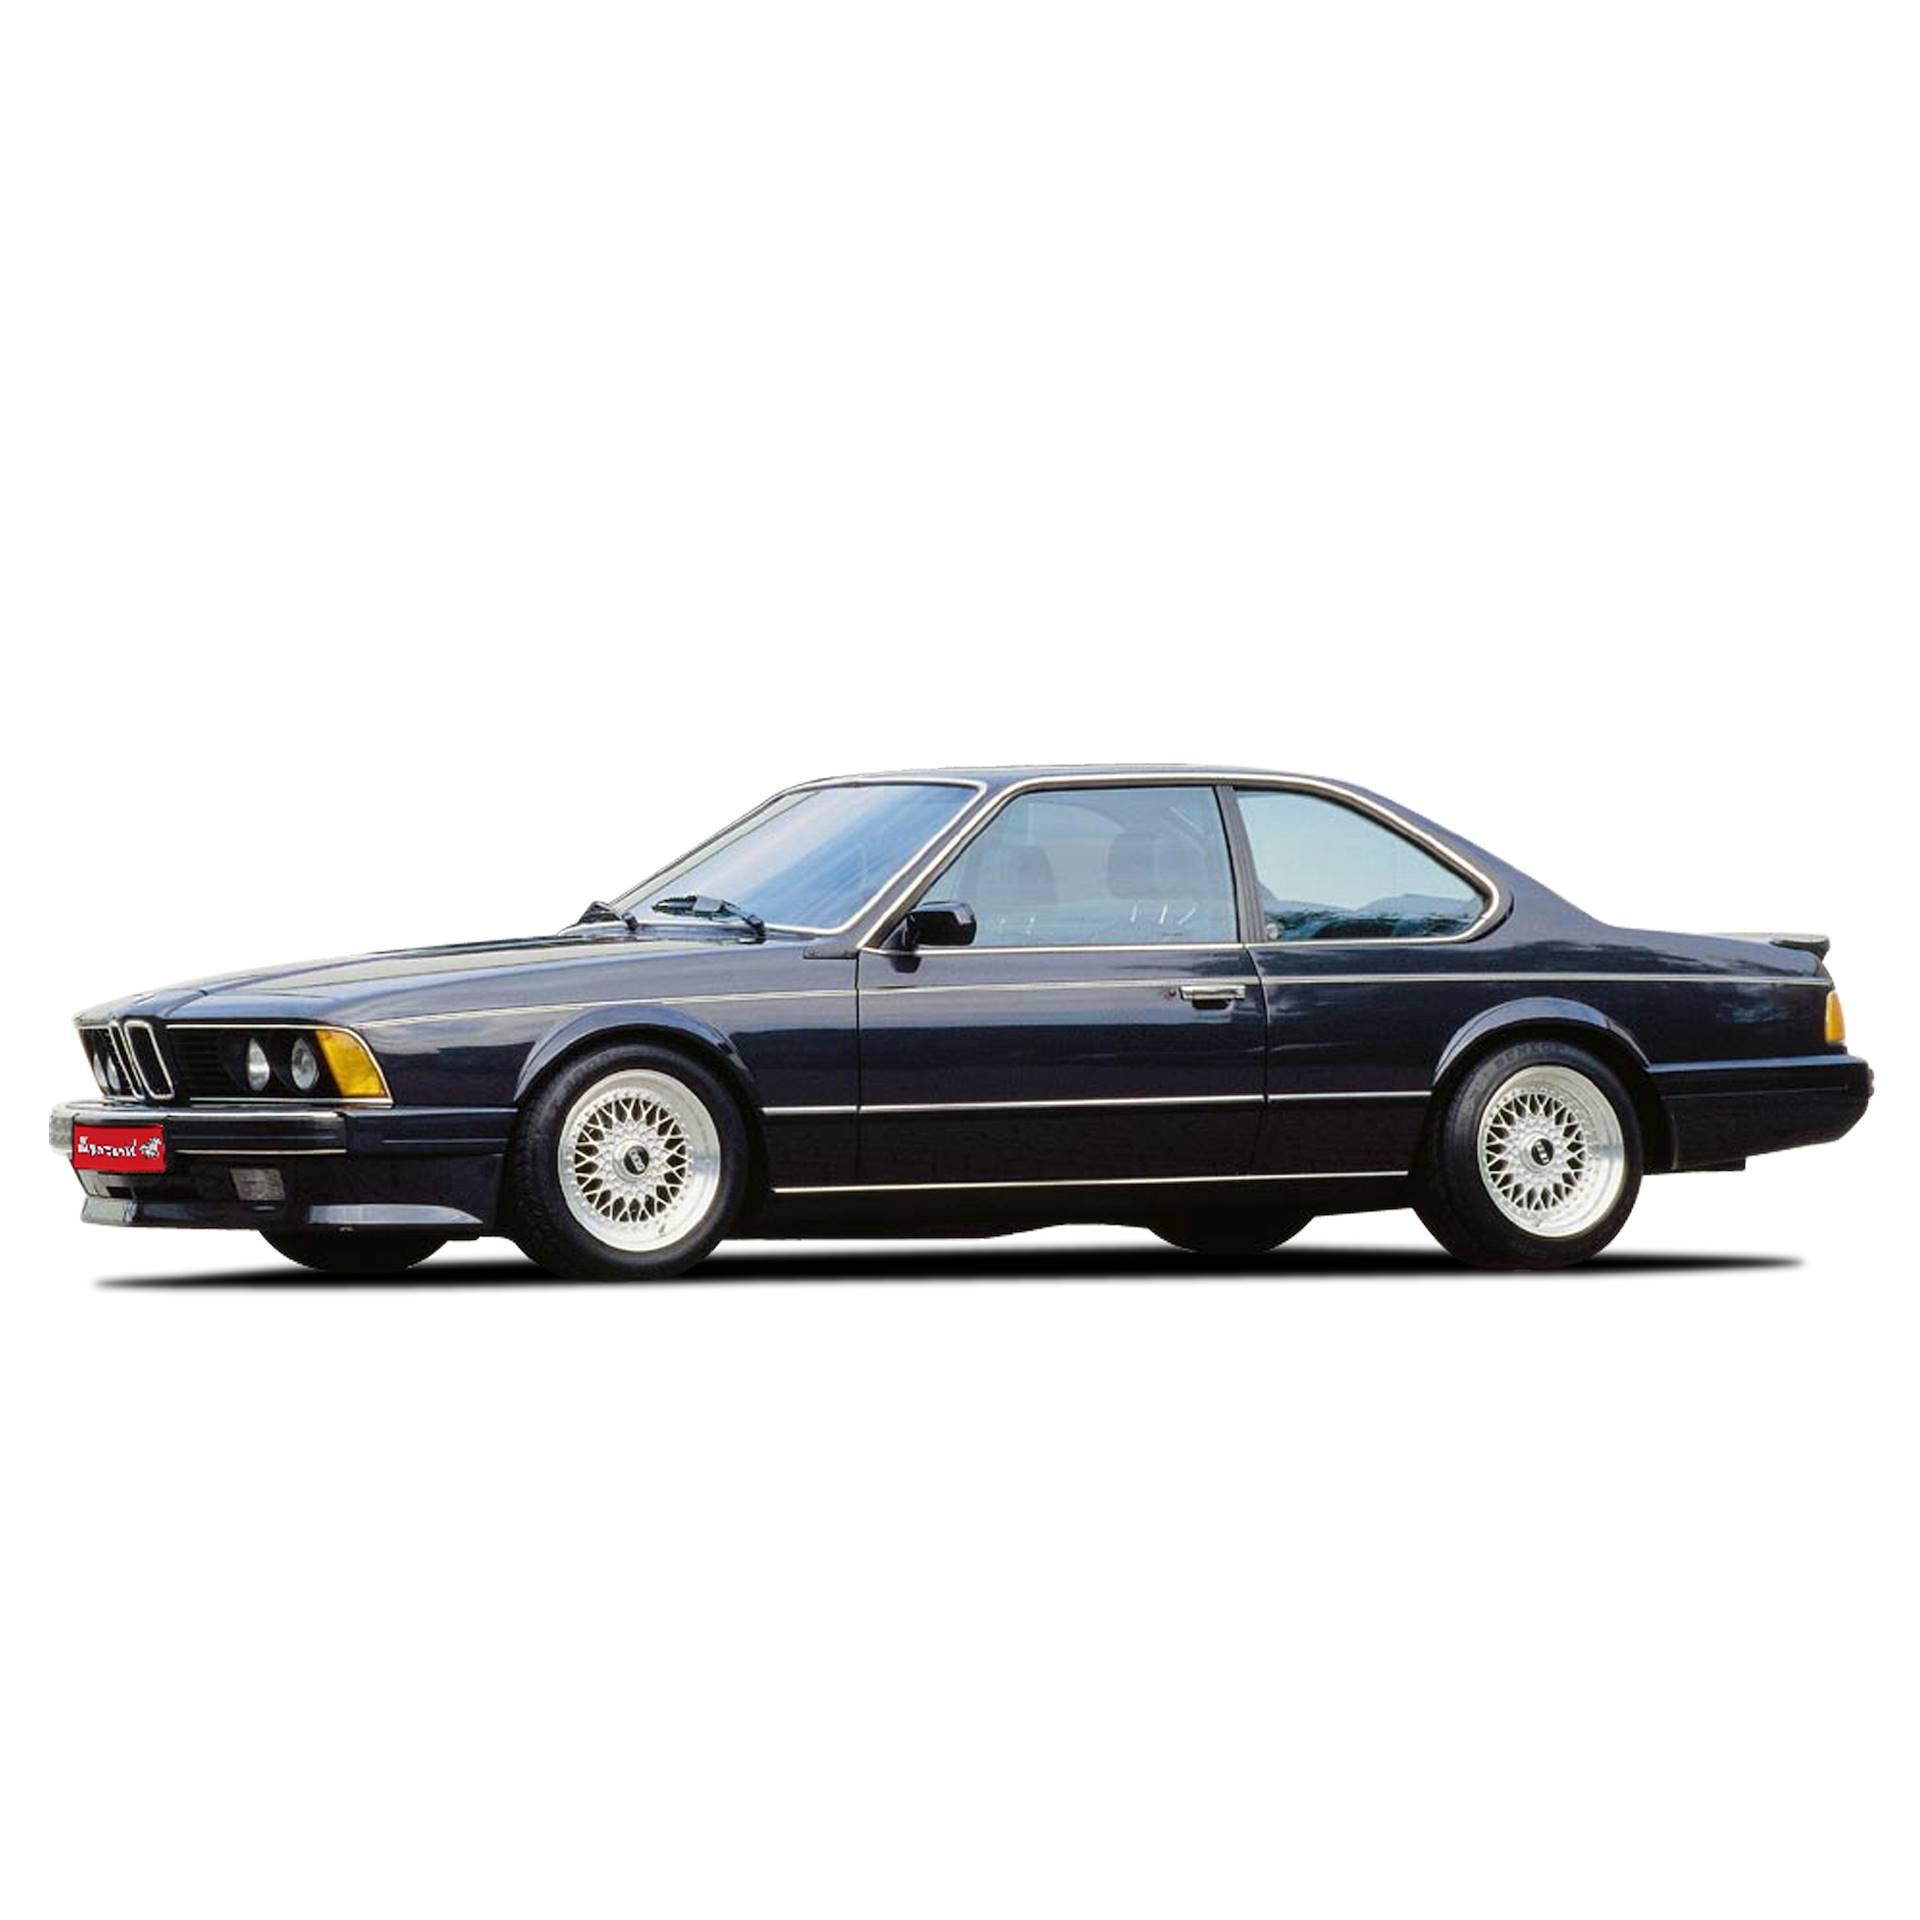 Sportauspuff Anlage Für BMW E24 635 CSi, BMW E24 635 CSi